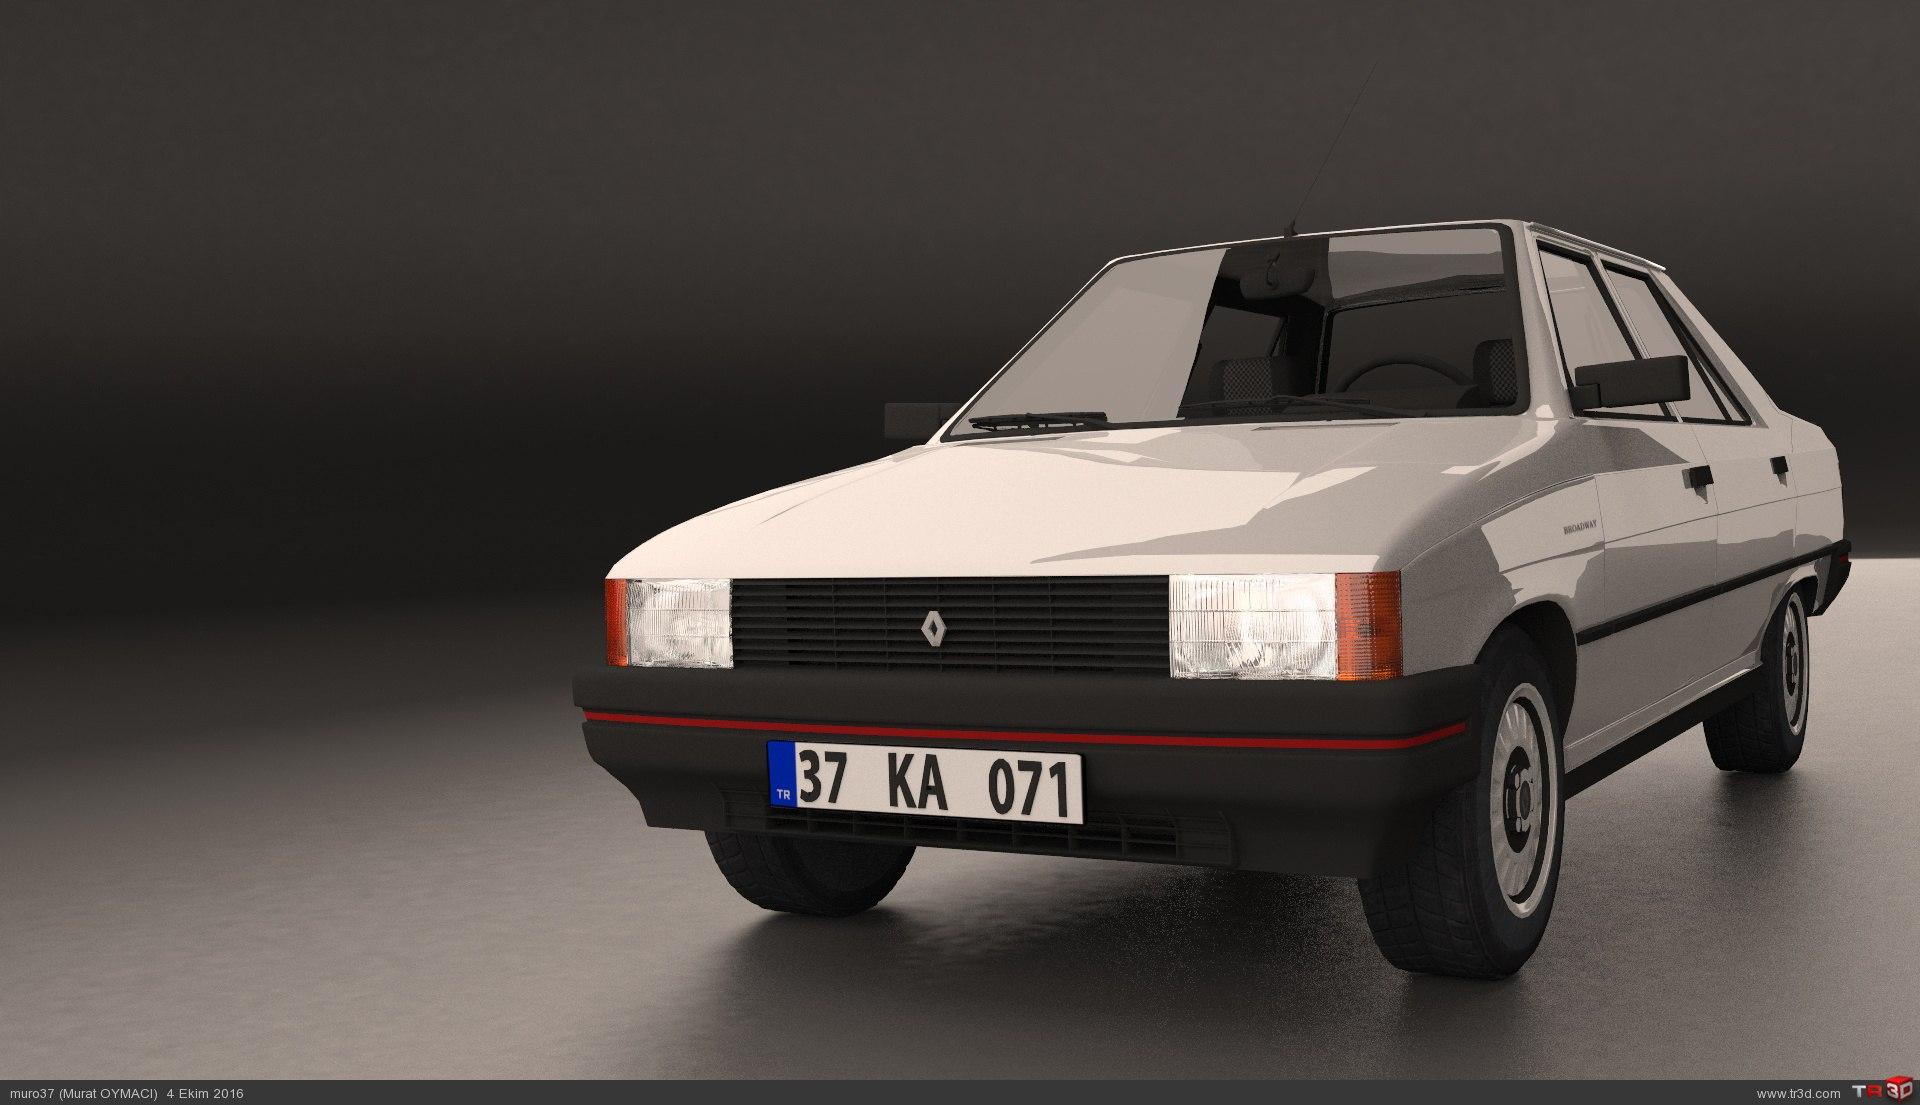 1992 Renault 9 Broadway